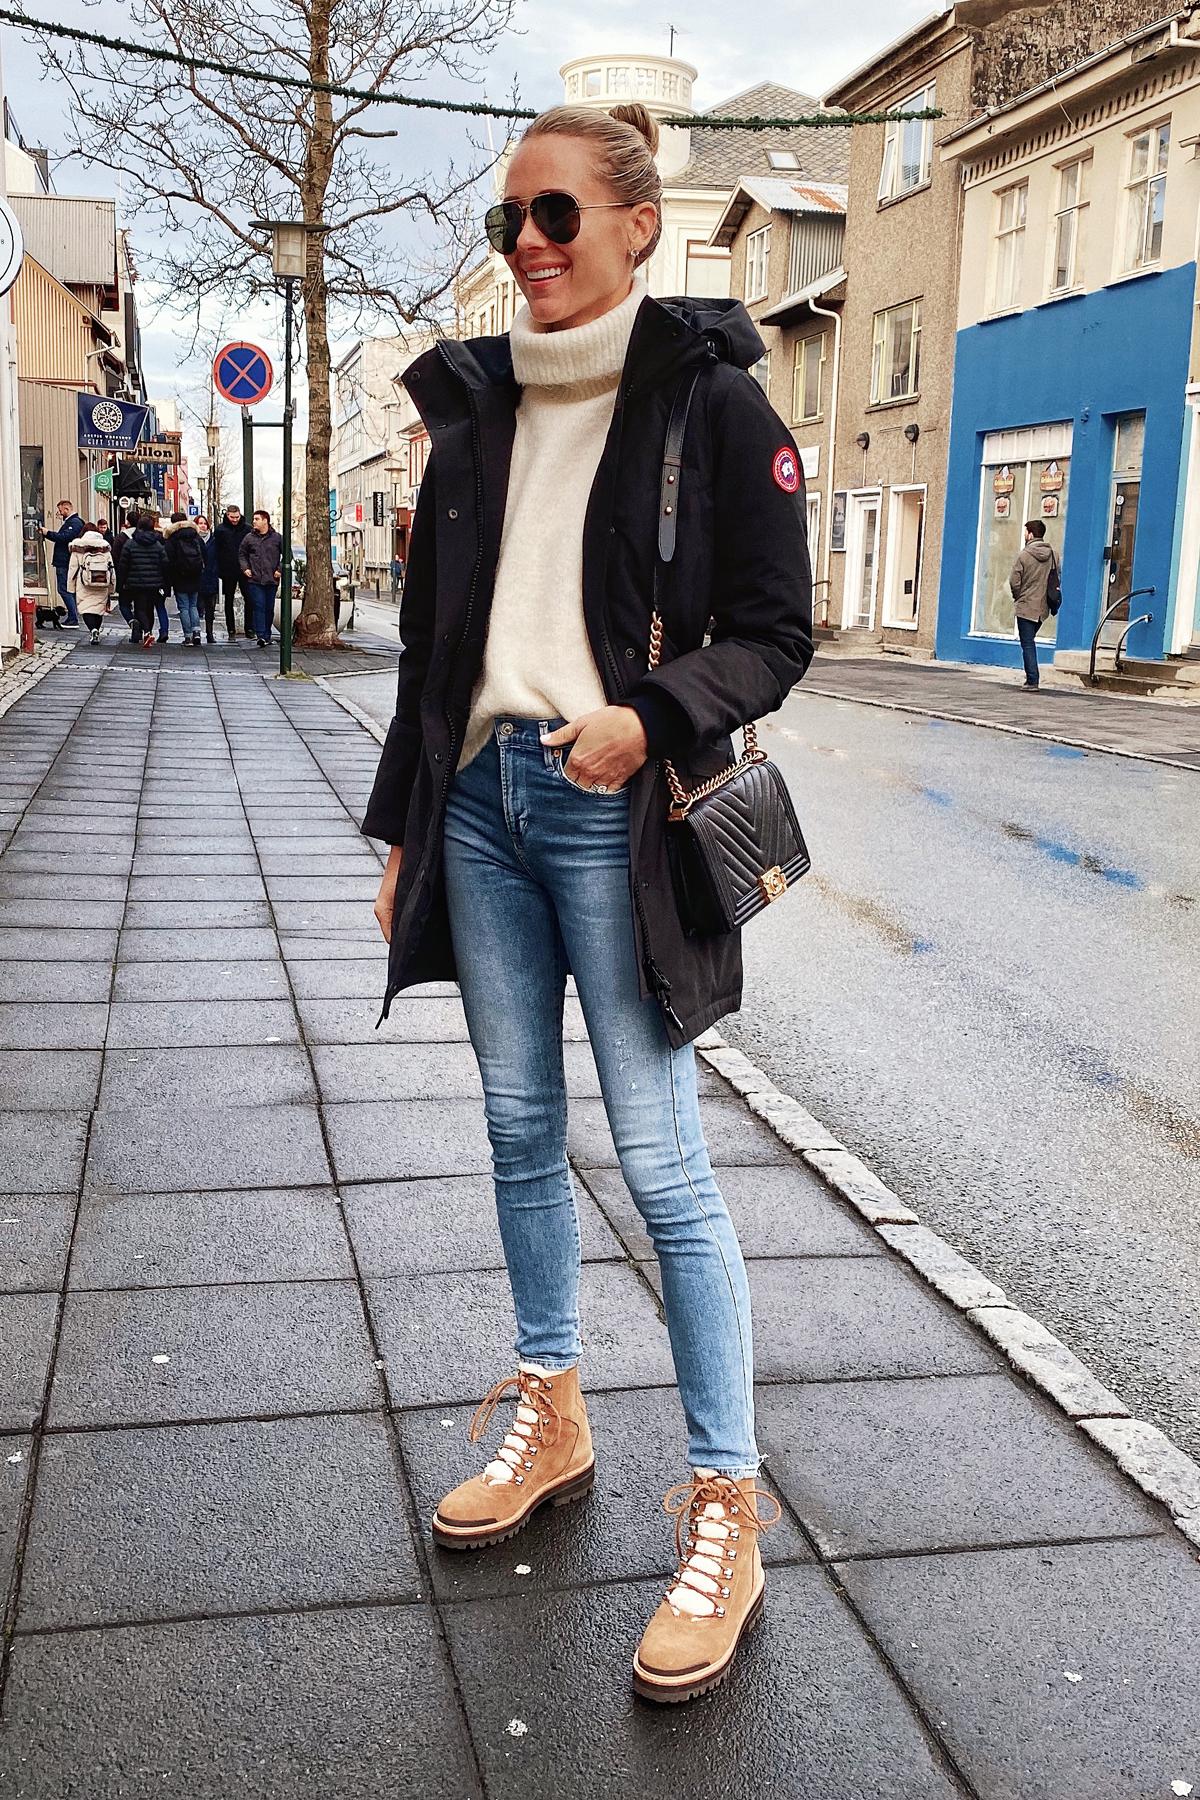 Fashion Jackson Wearing Canada Goose Black Jacket White Sweater Winter Boots Iceland Itinerary Travel Guide